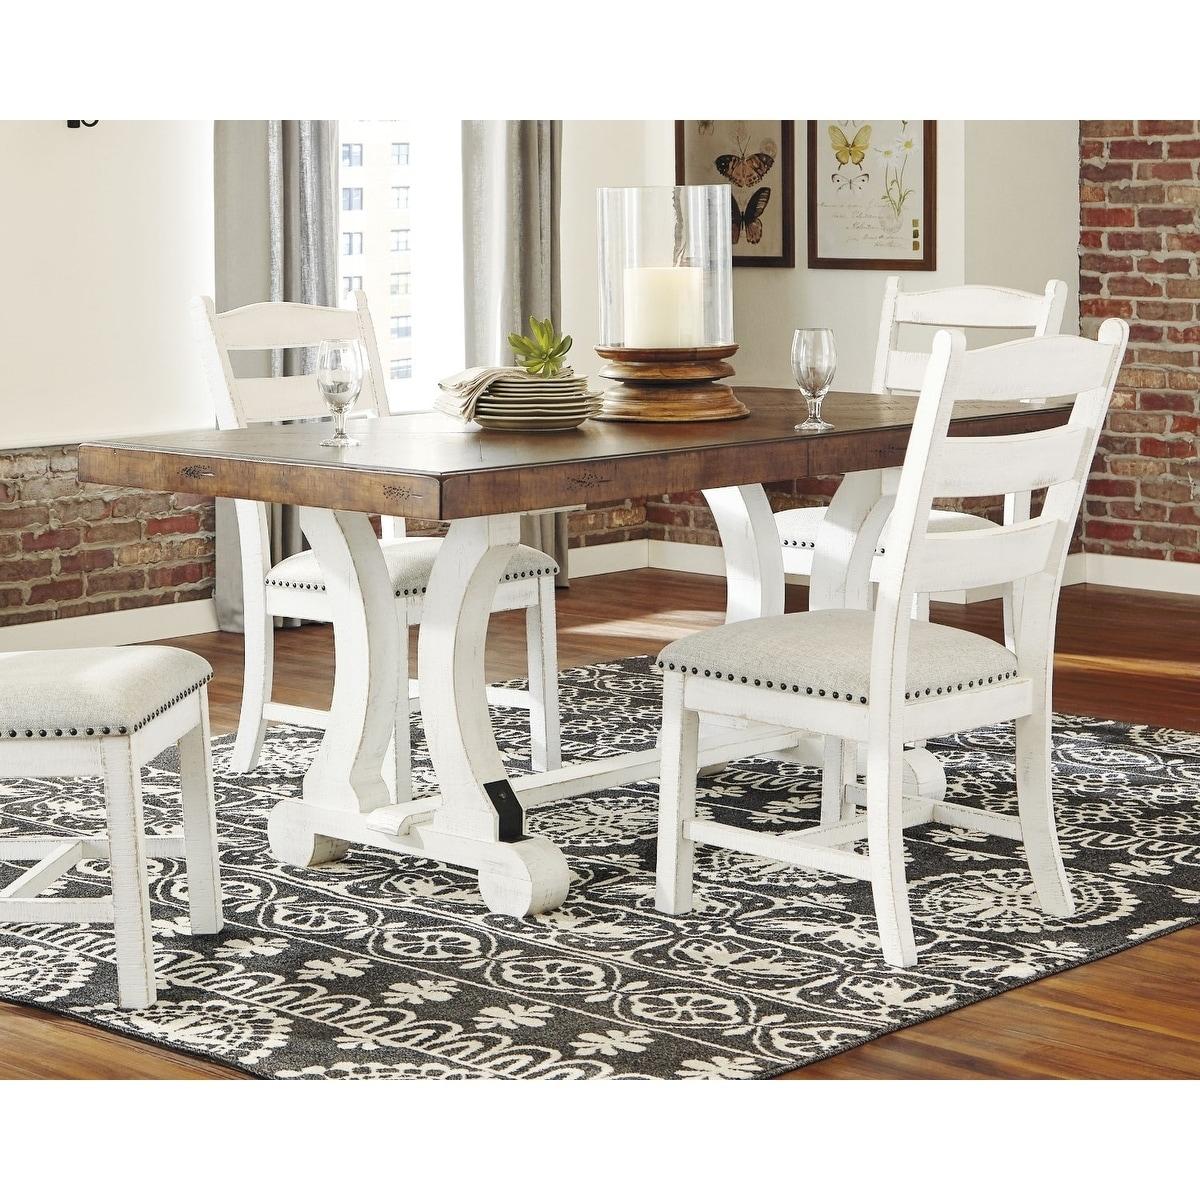 Valebeck Rectangular Dining Room Table - White/Brown - Overstock